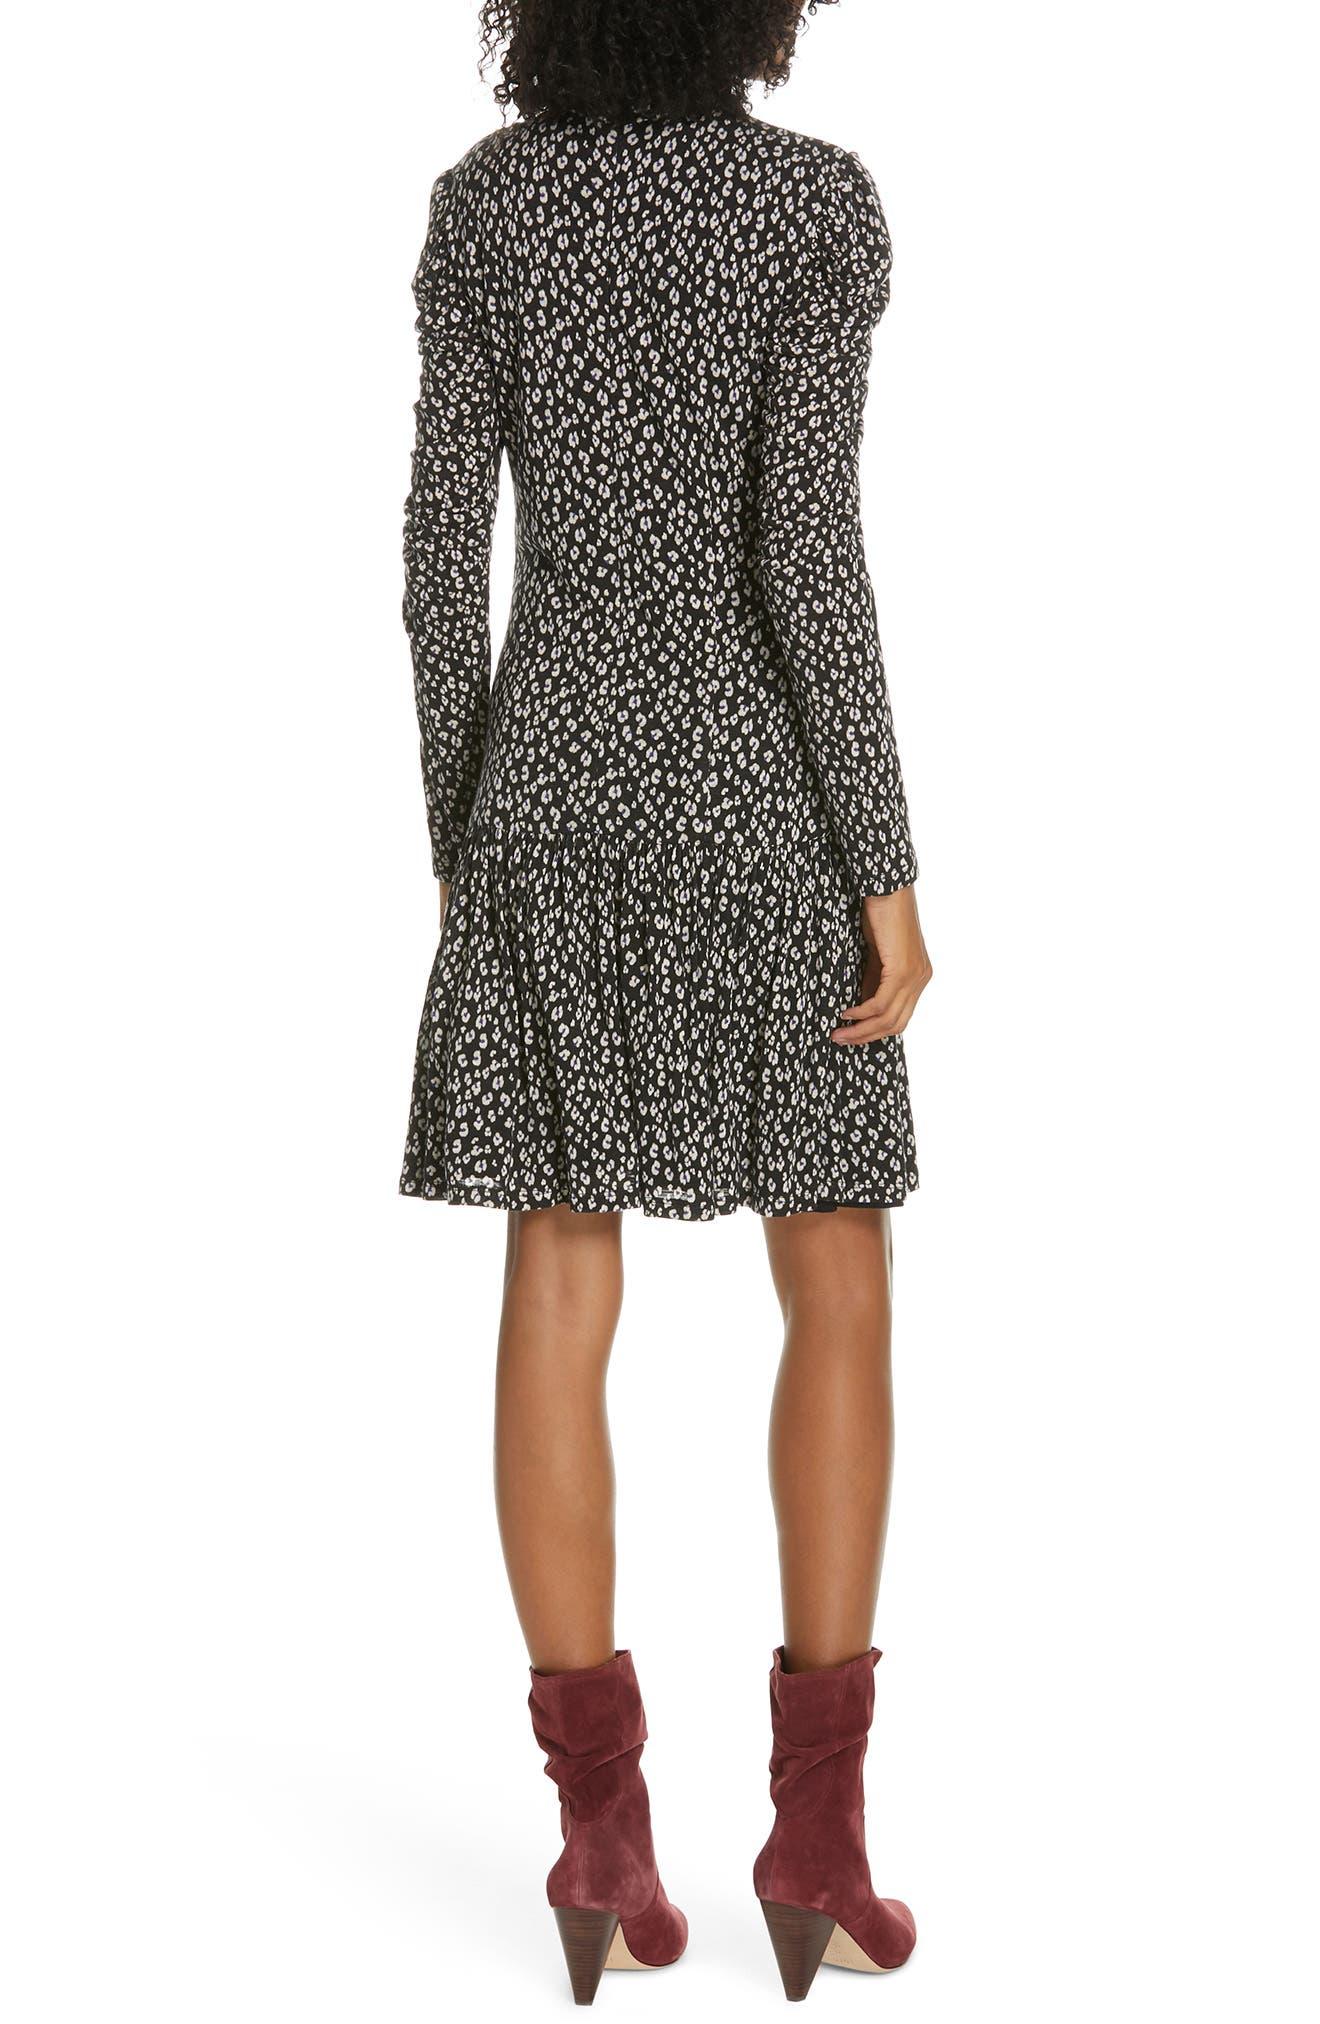 REBECCA TAYLOR, Cheetah Ruched Jersey Dress, Alternate thumbnail 2, color, 014